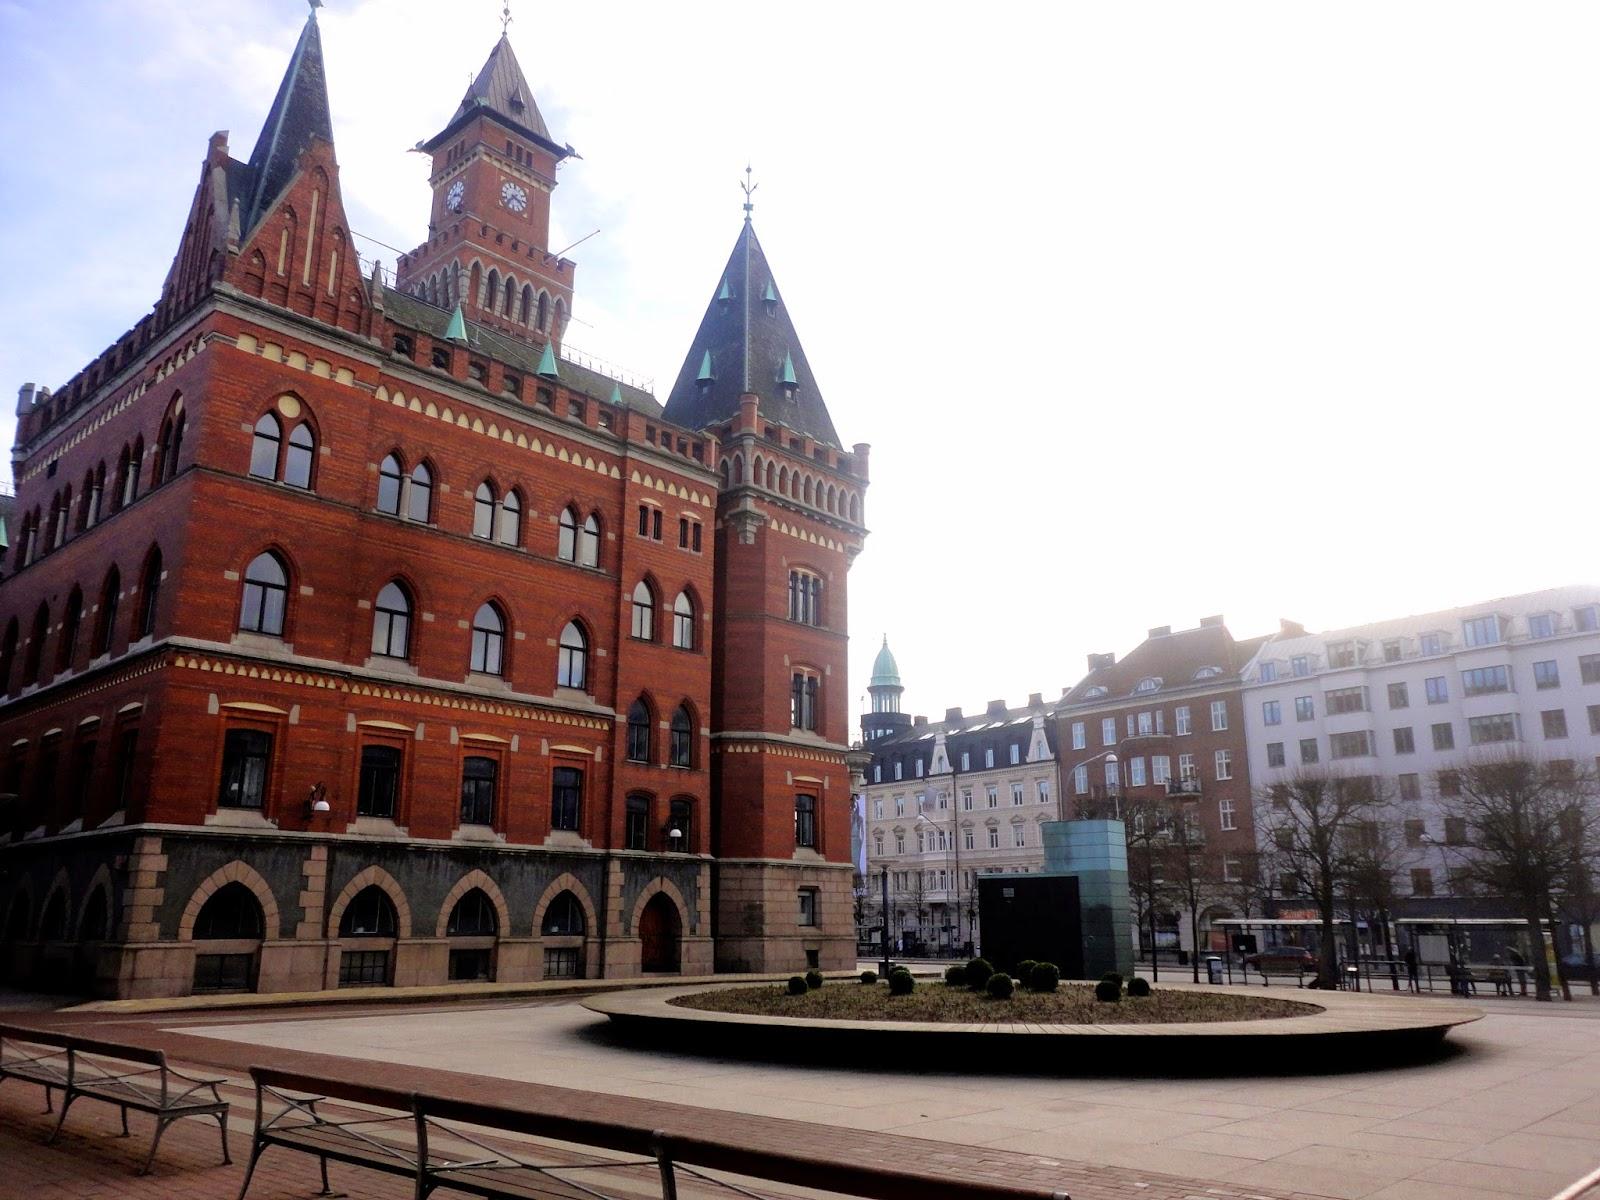 Helsingborg town hall, Sweden